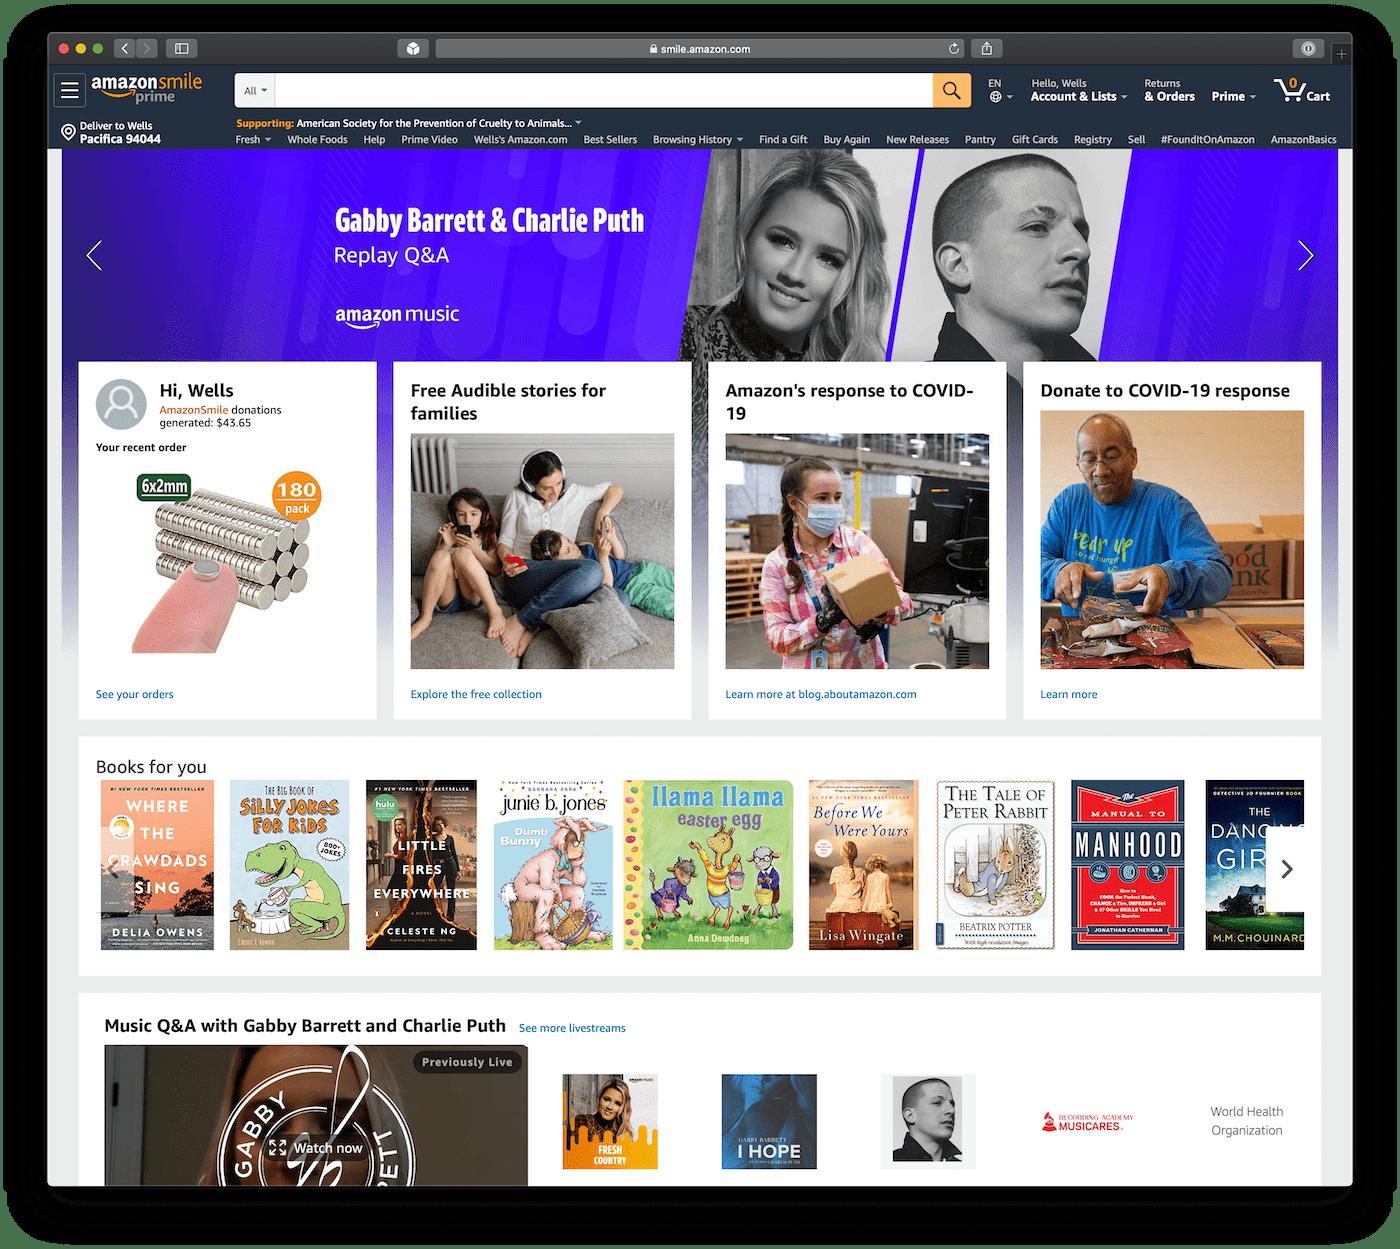 amazon.com homepage before